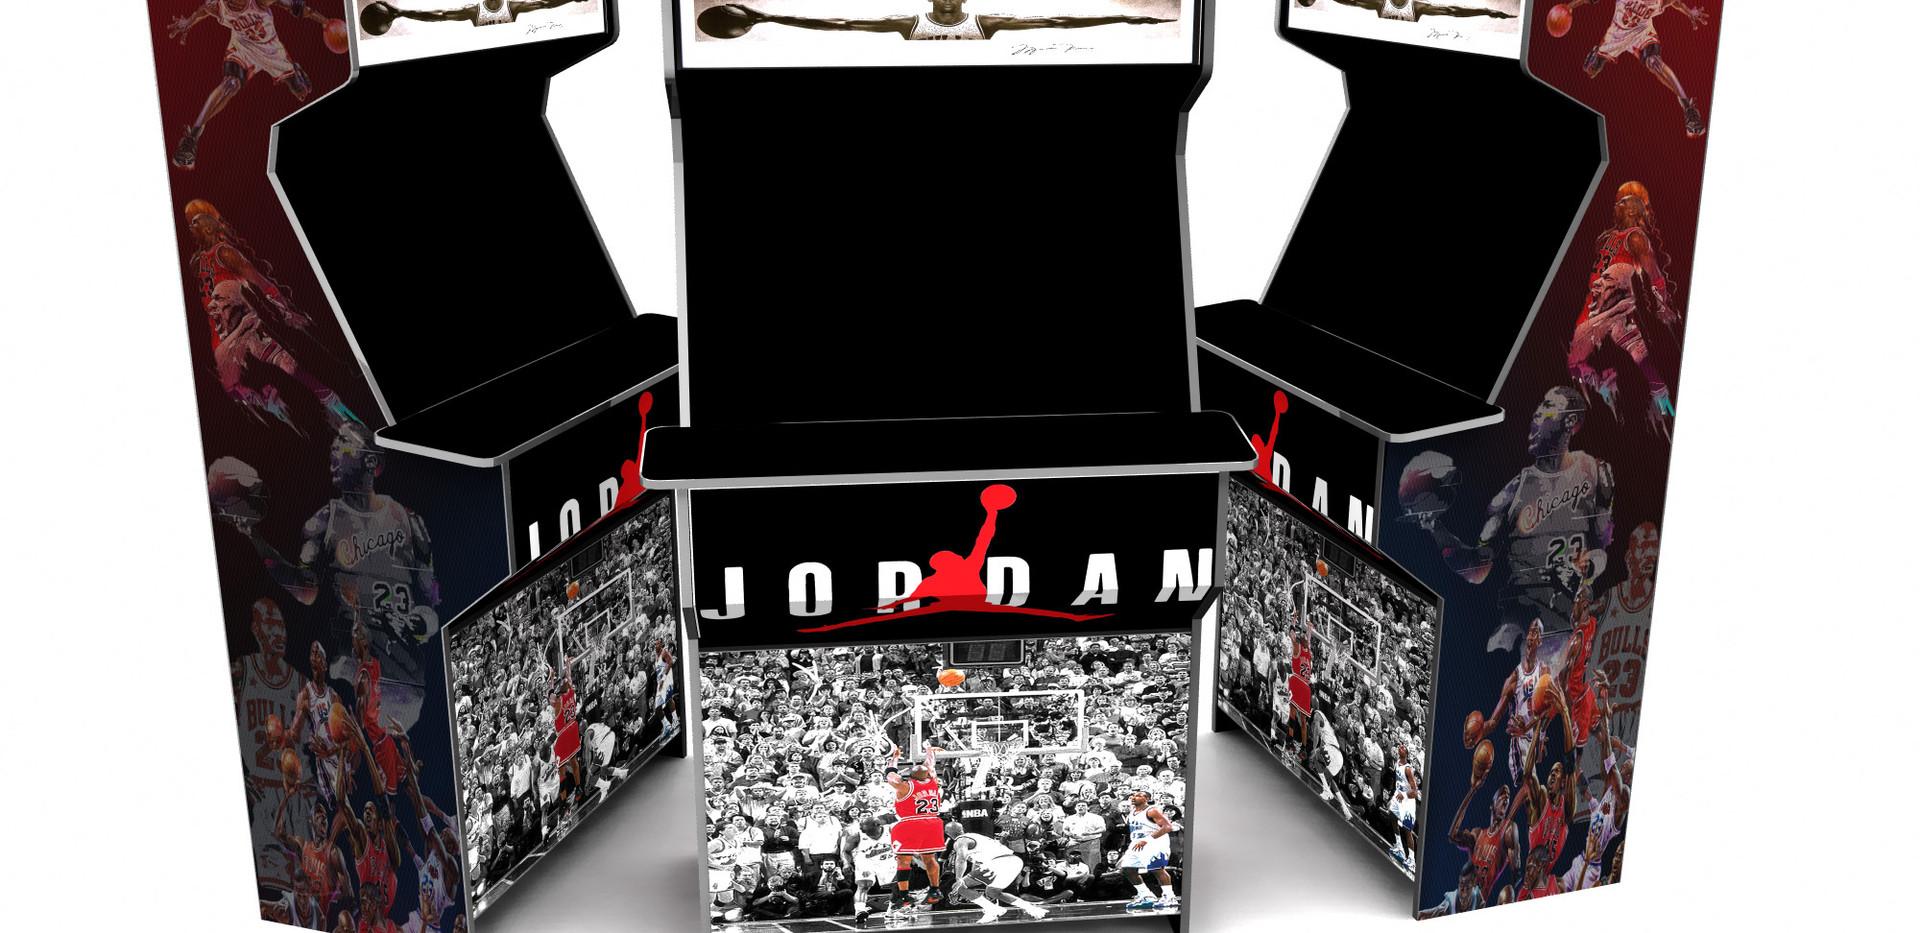 Michael Jordan Arcade